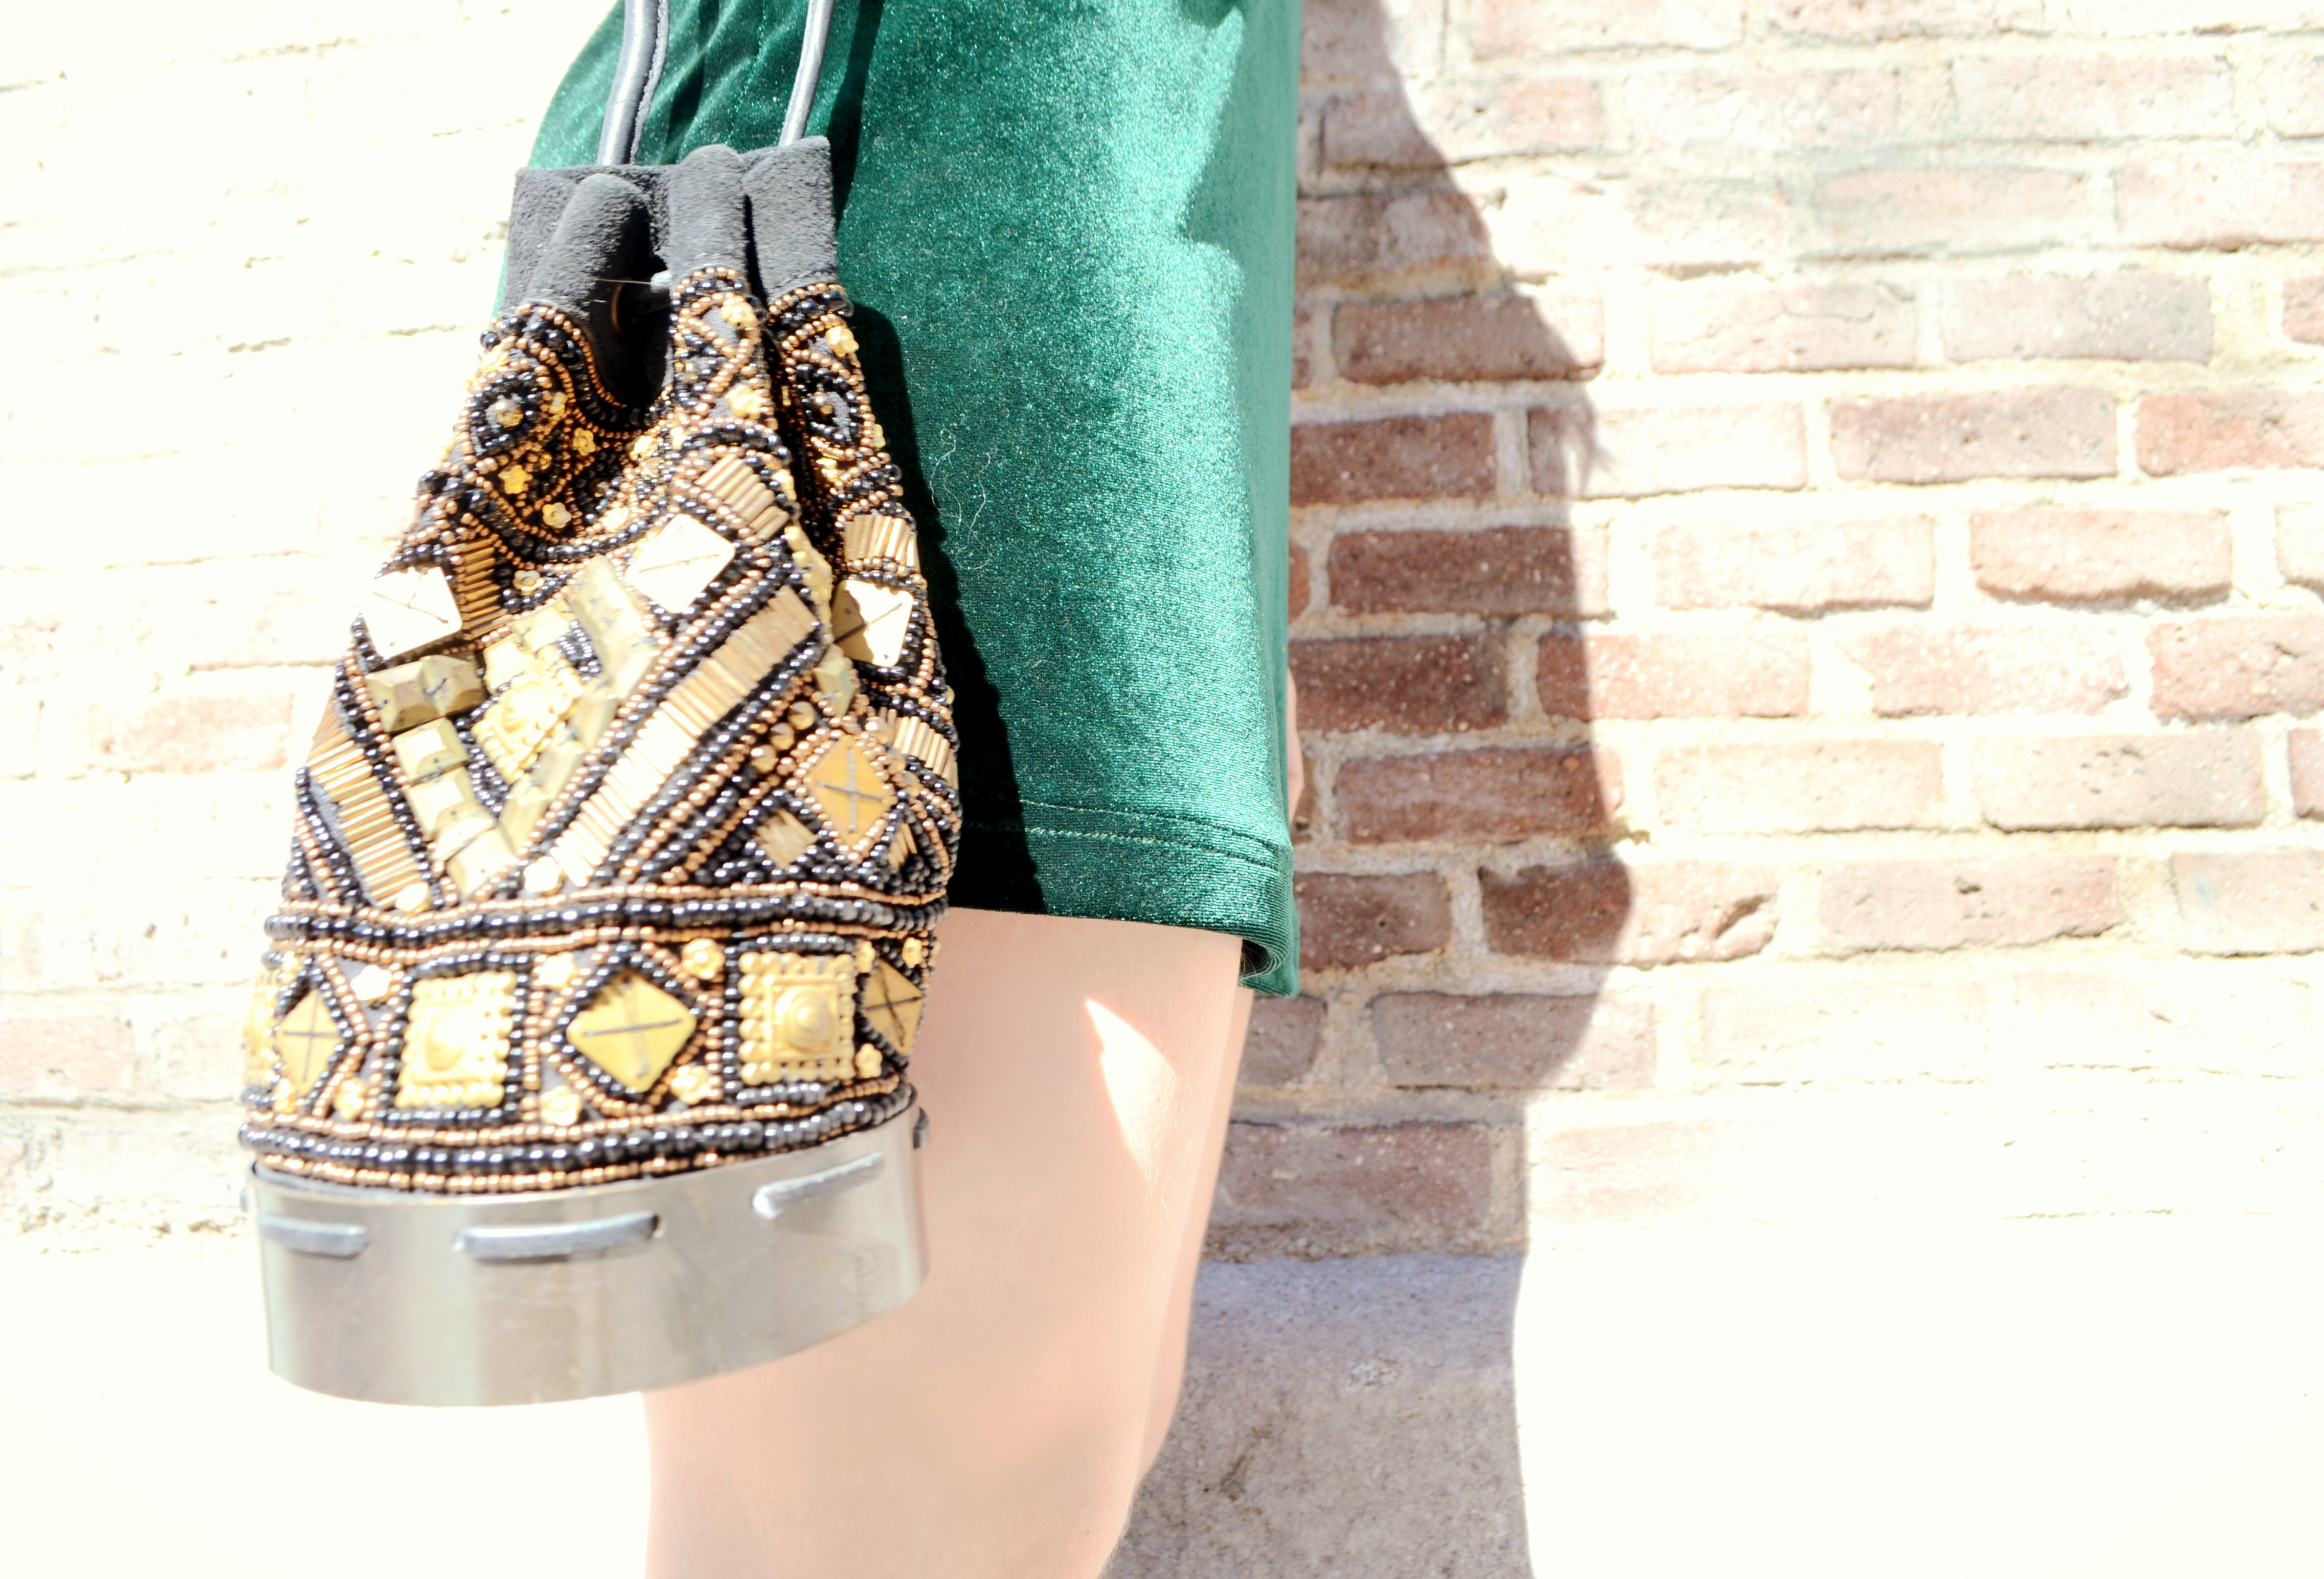 Blog-de-moda-ChicAdicta-fashionista-velvet-dress-shein-Chic-Adicta-vestido-verde-boho-style-spring-outfit-PiensaenChic-Piensa-en-Chic